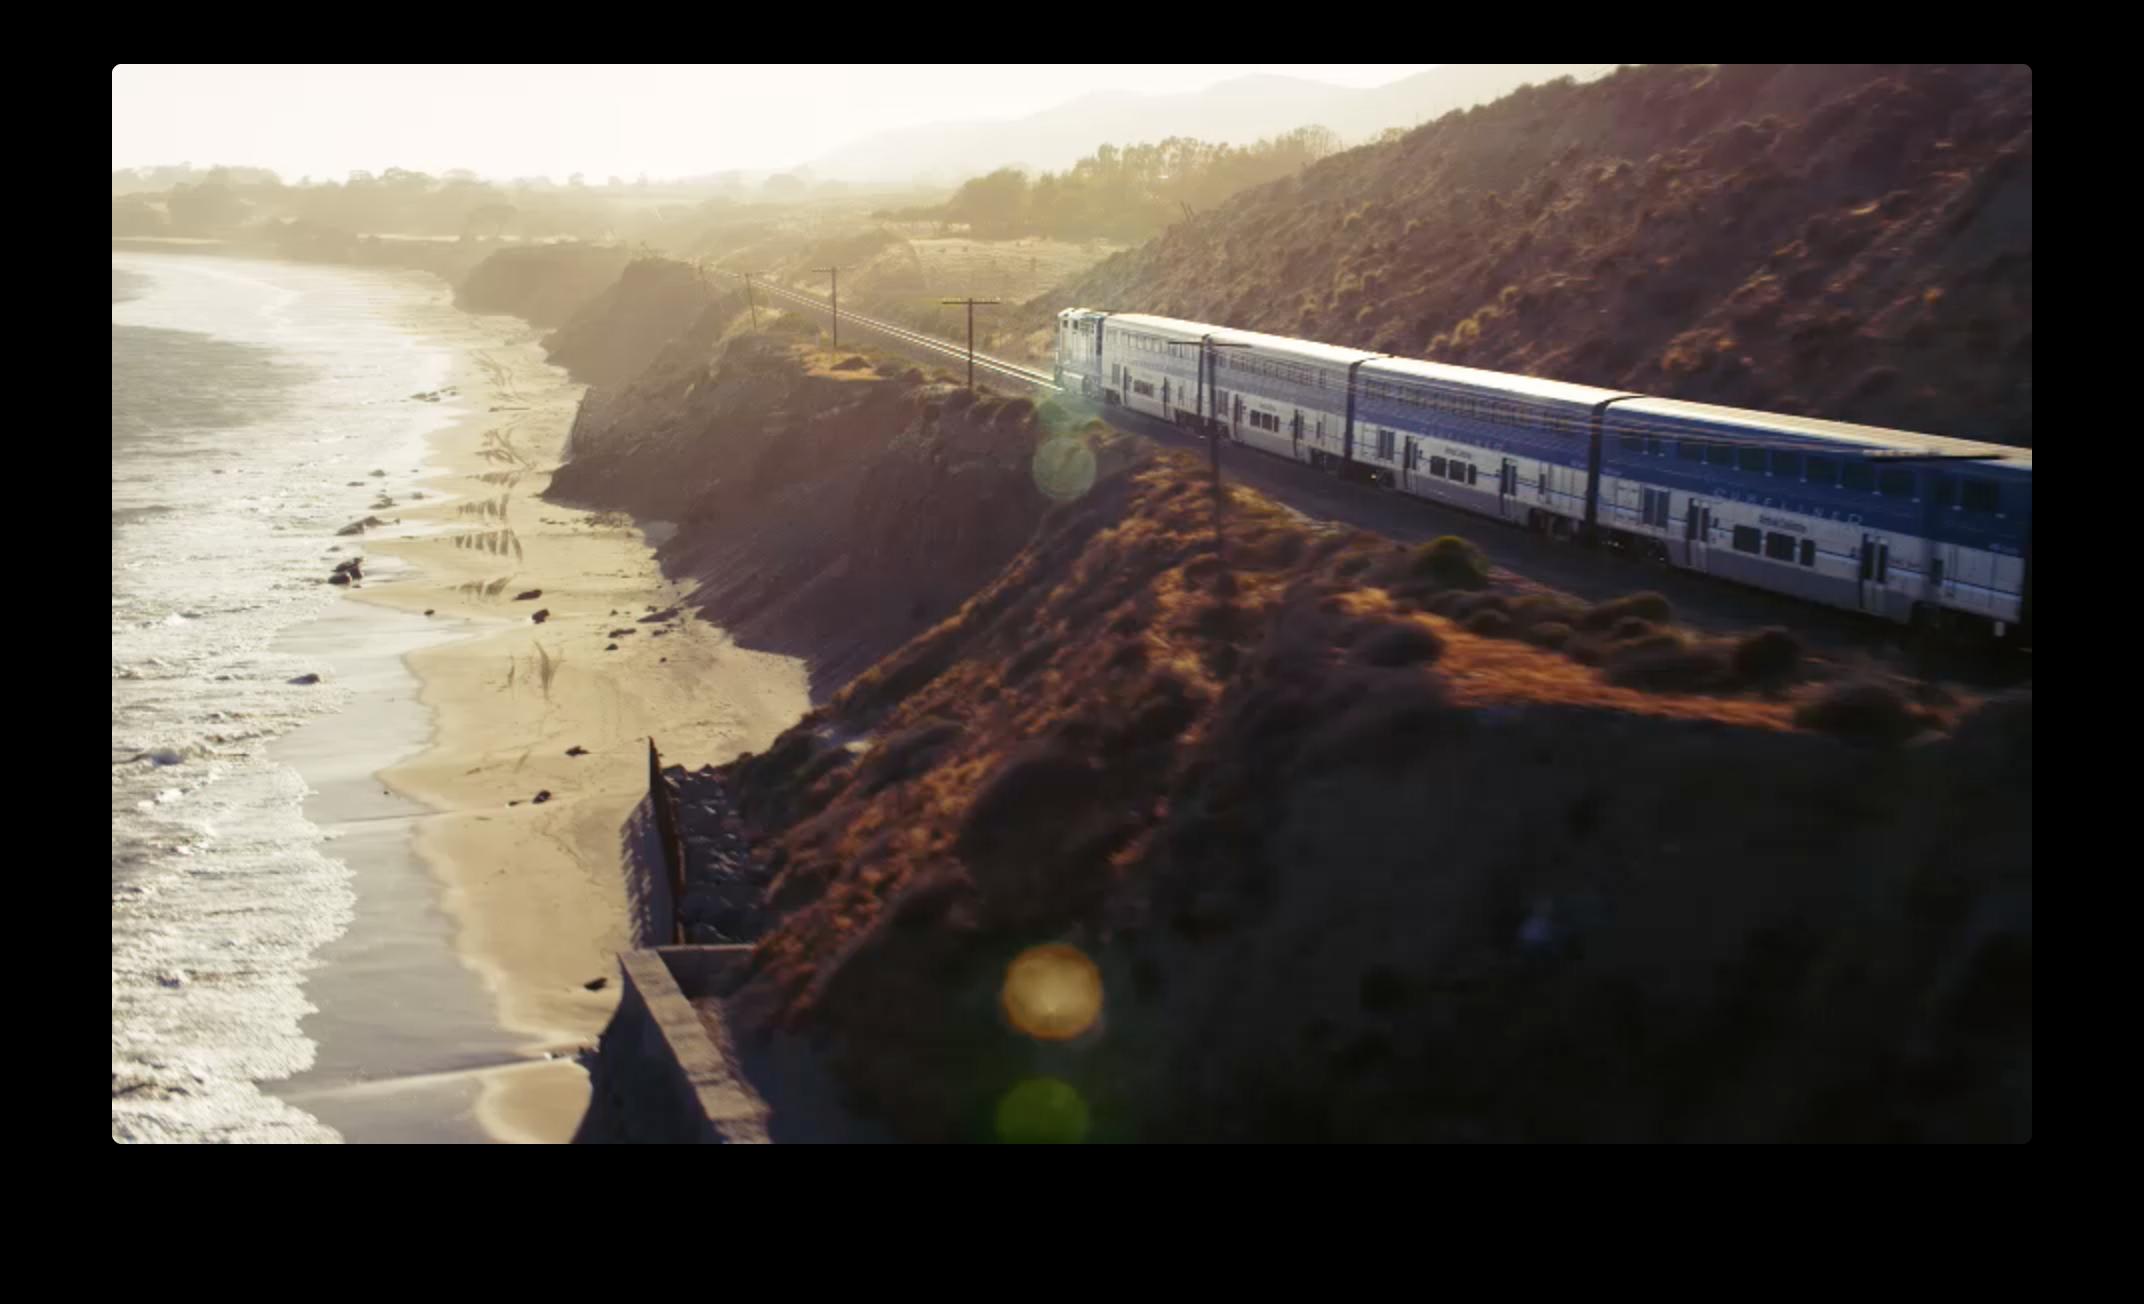 Amtrak - Infinite Stories